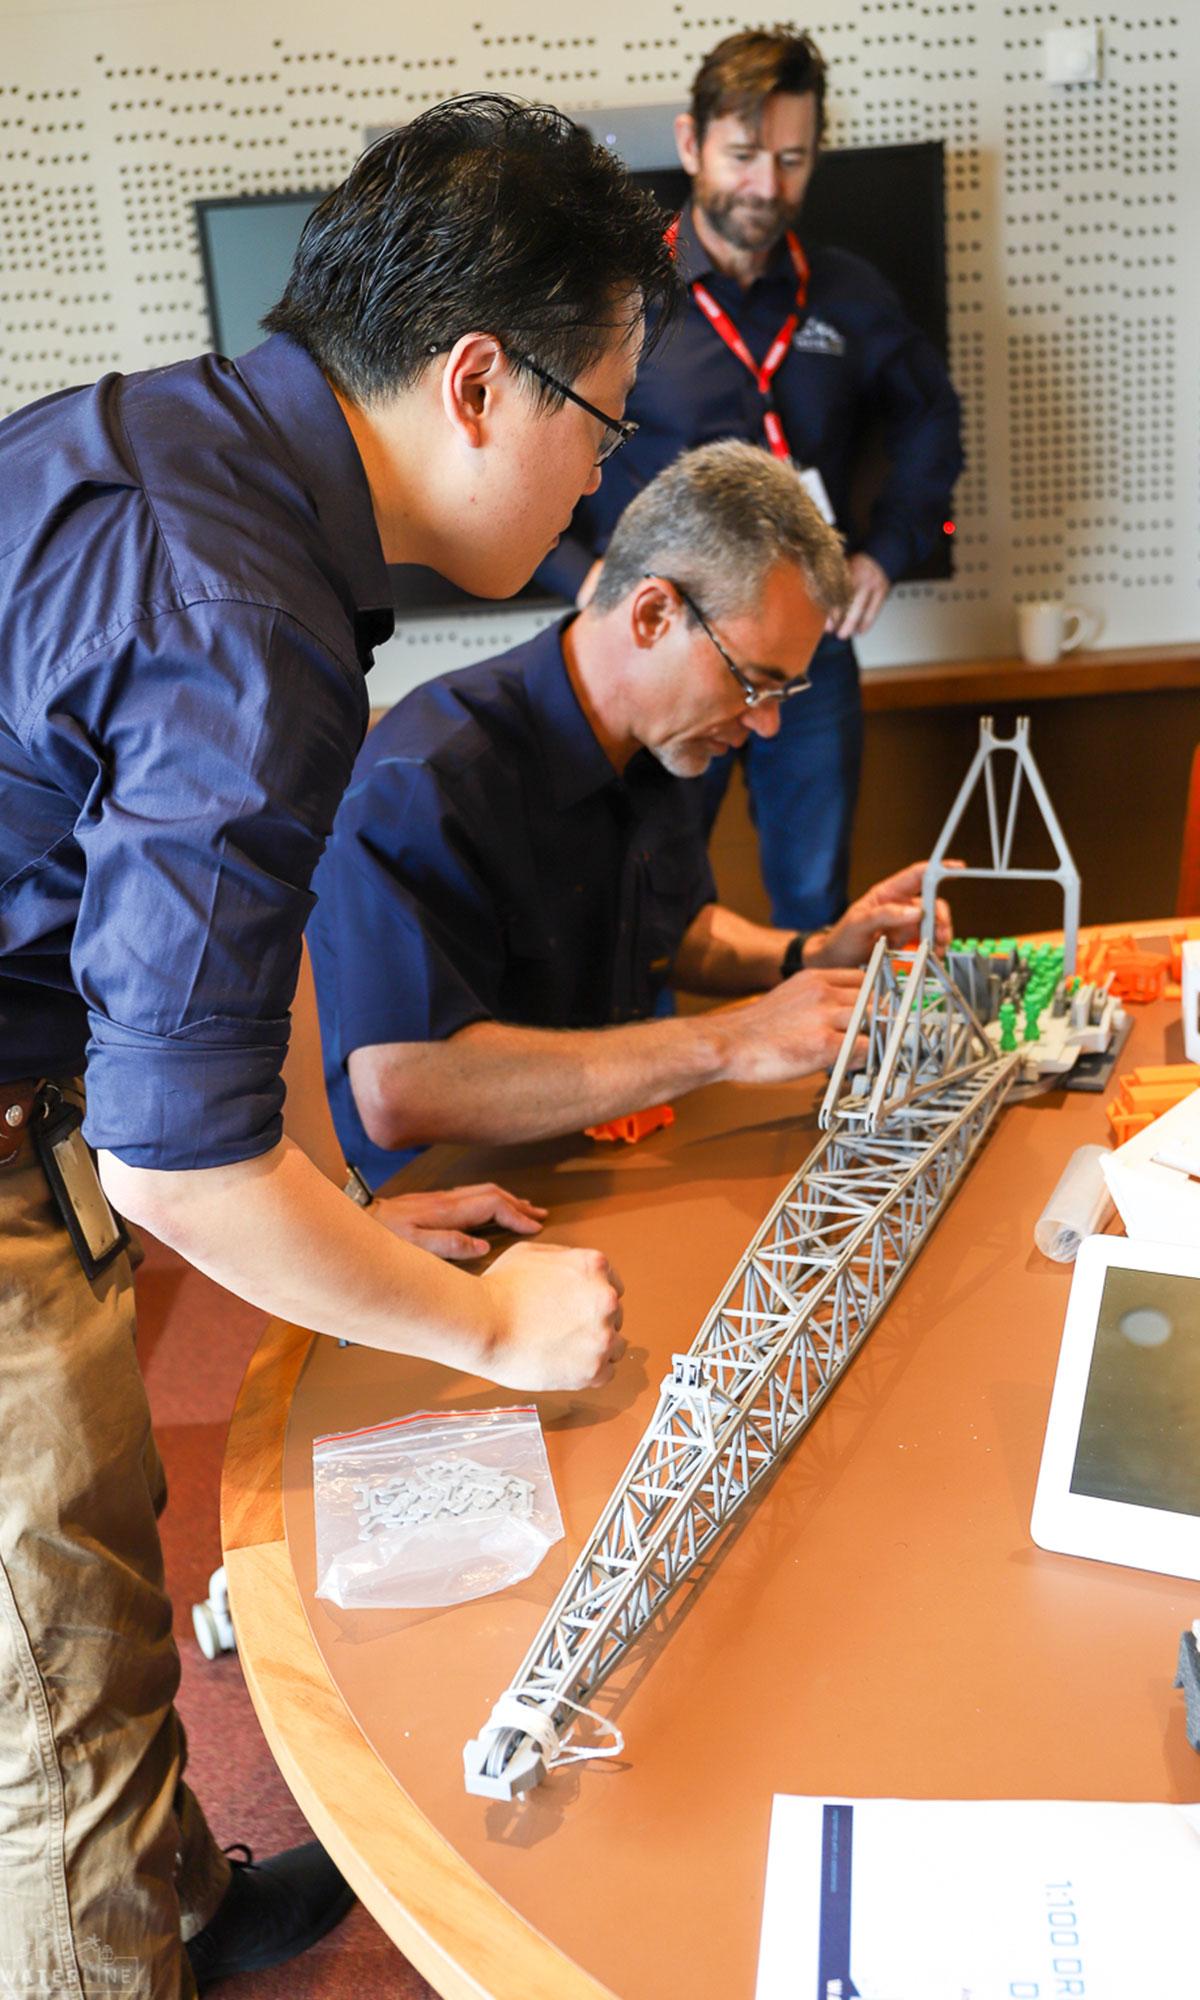 Waterline's Mike Hsu and Randall Makin, walking Johan Vilojen of BHP through how the model works